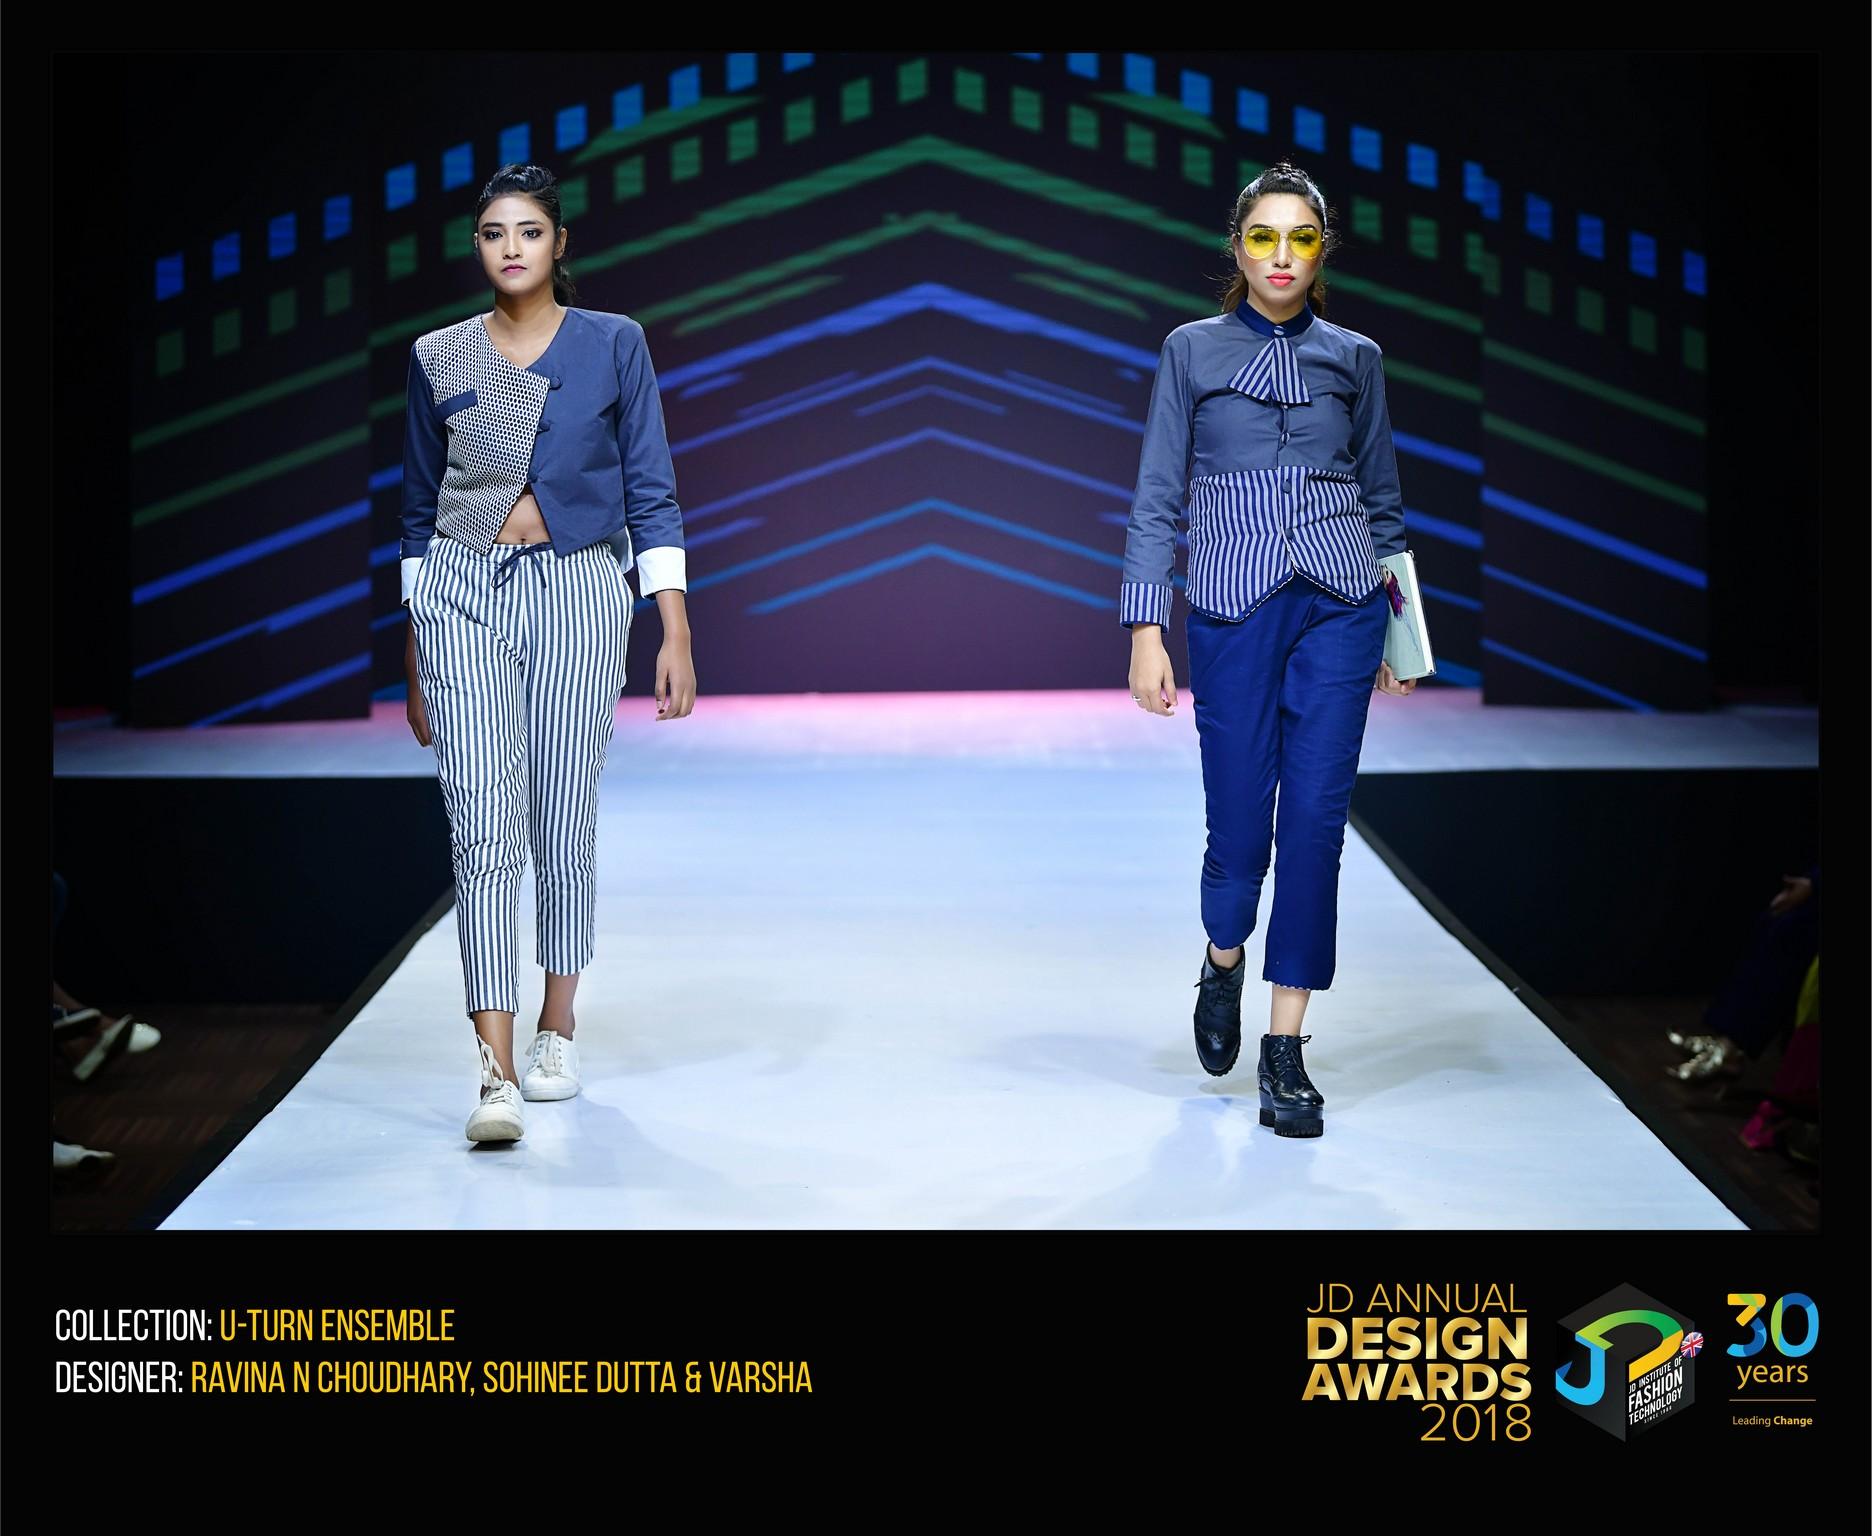 The U-turn ensemble – Change – JD Annual Design Awards 2018 | Designer: Sohinee, Ravina and Varsha | Photography : Jerin Nath (@jerin_nath) the u-turn ensemble - U TURN ENSEMBLE 6 - The U-turn ensemble – Change – JD Annual Design Awards 2018